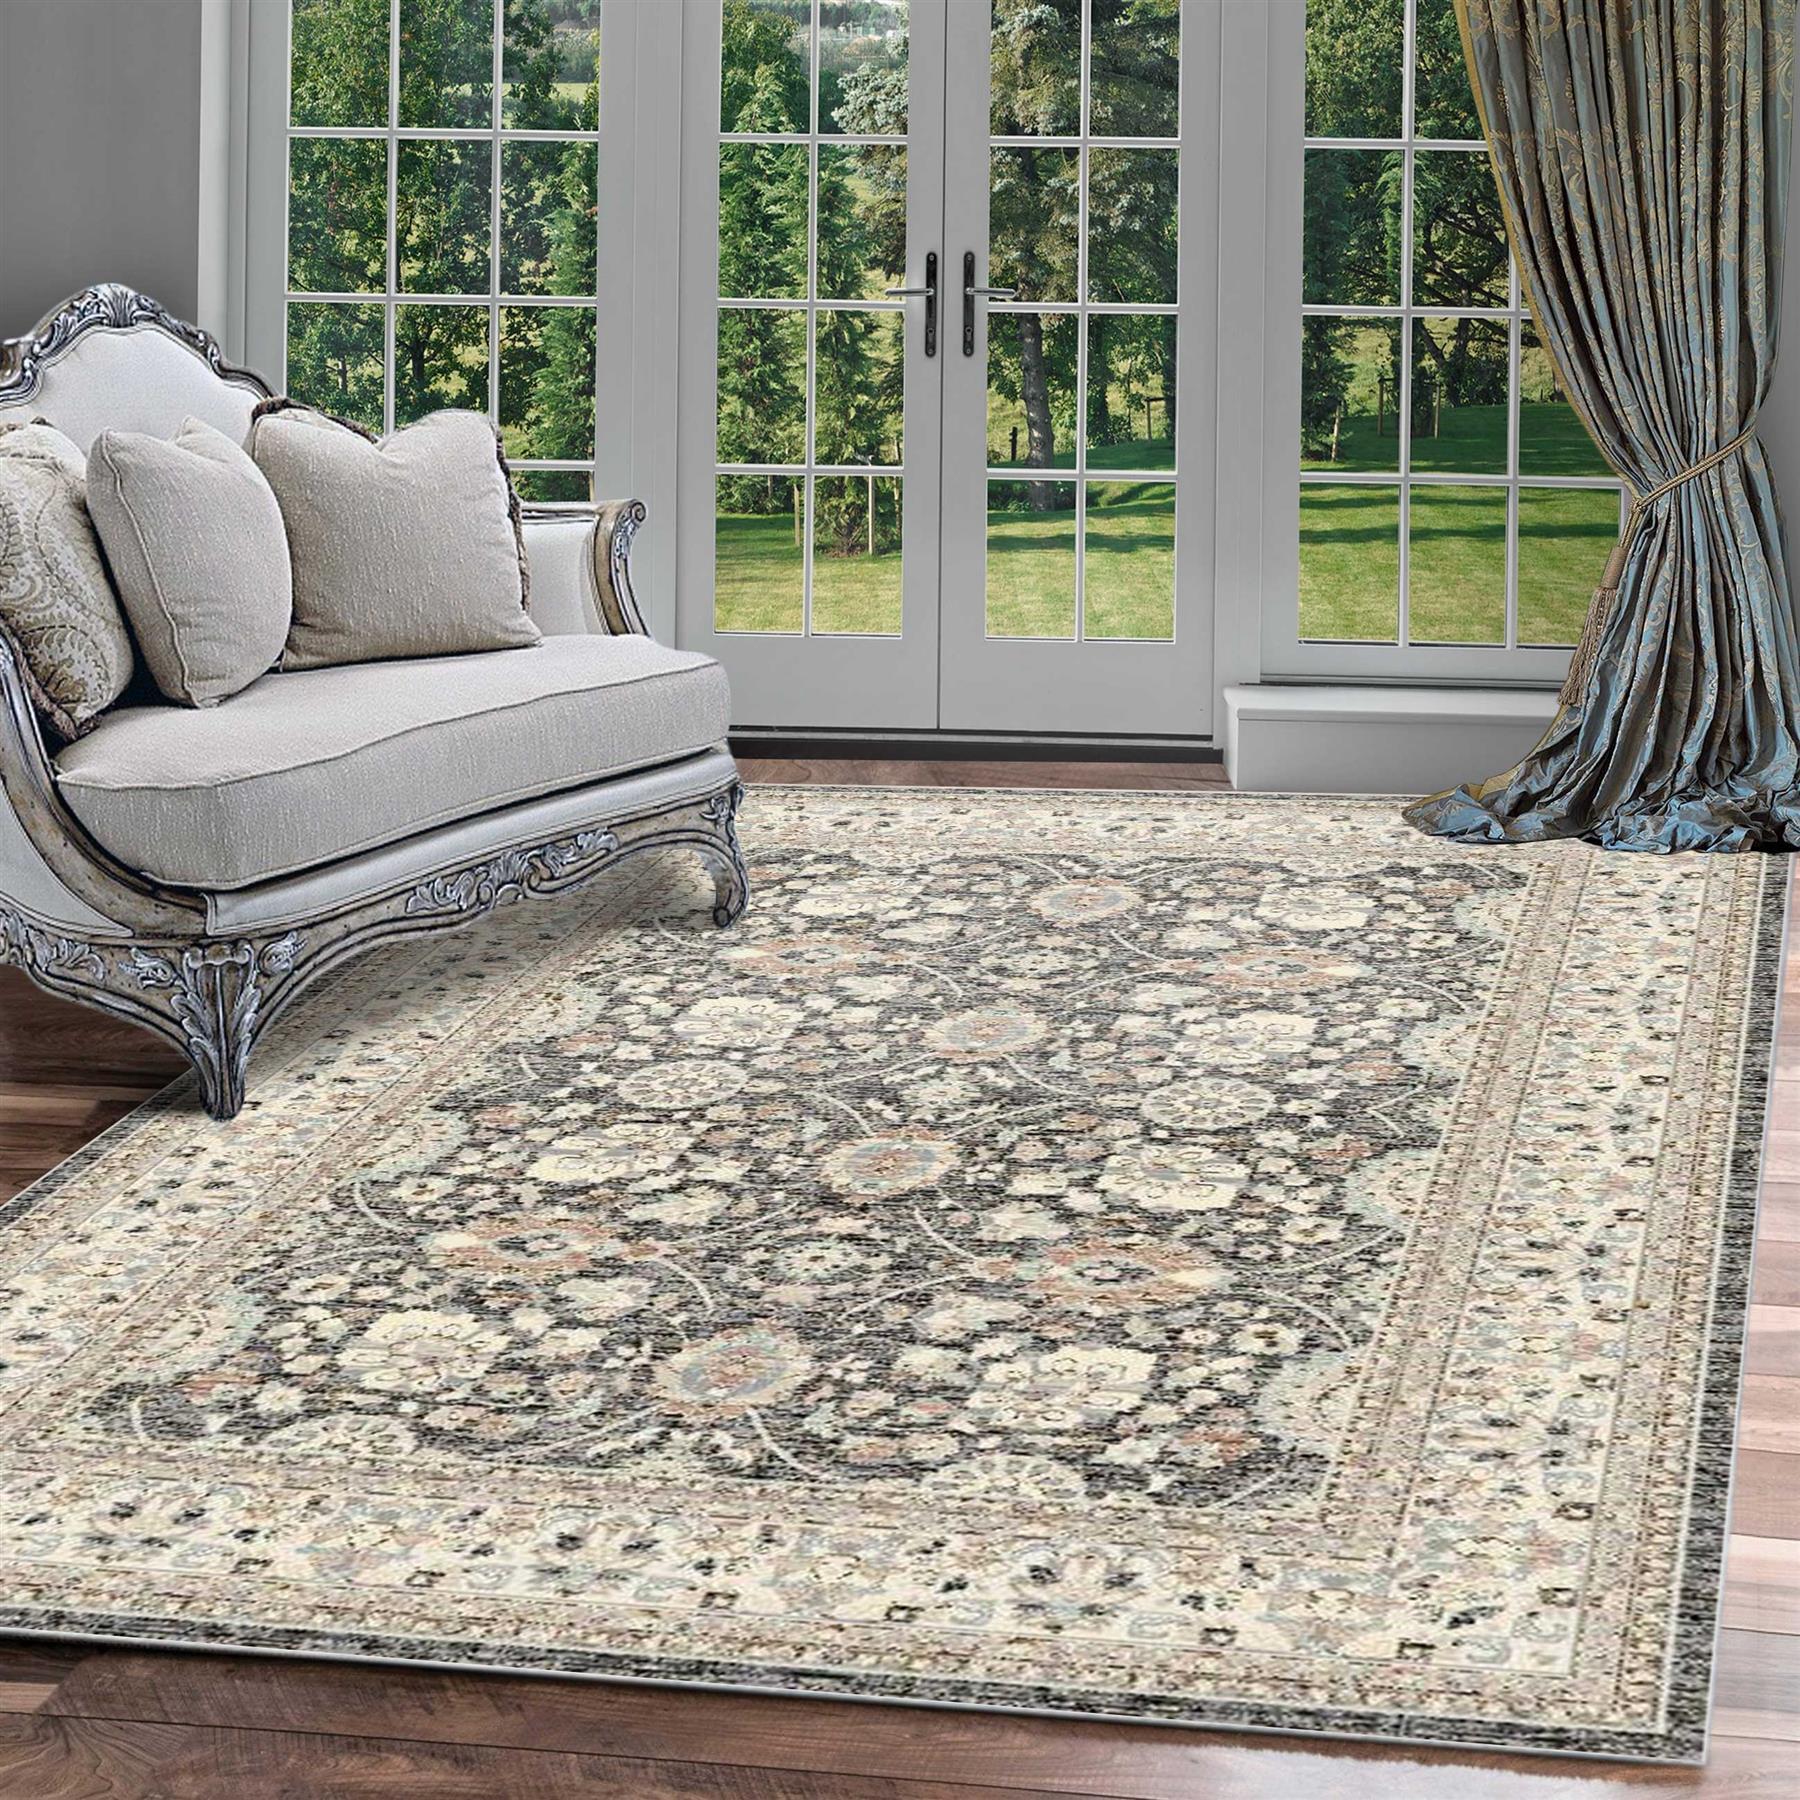 Details About A2z Rug Vintage Style Geometric Floral Living Room Floor Rugs Boho Berber Carpet